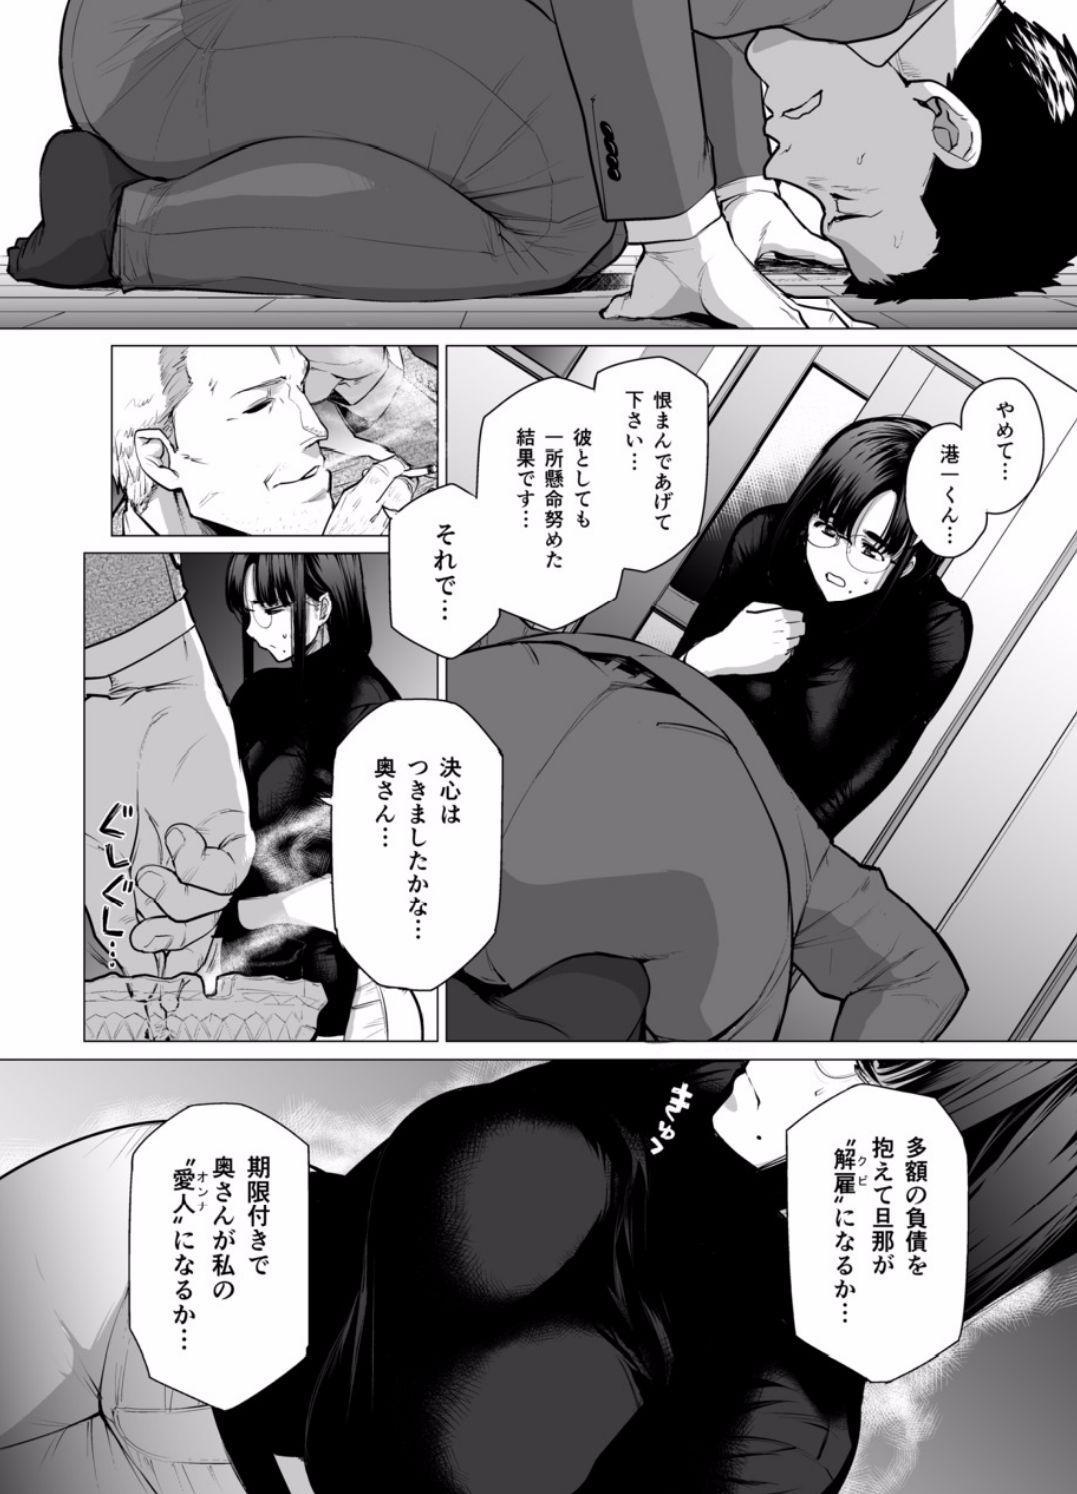 [Etuzan Jakusui] Somerare - Mizu Yari 1-3 5